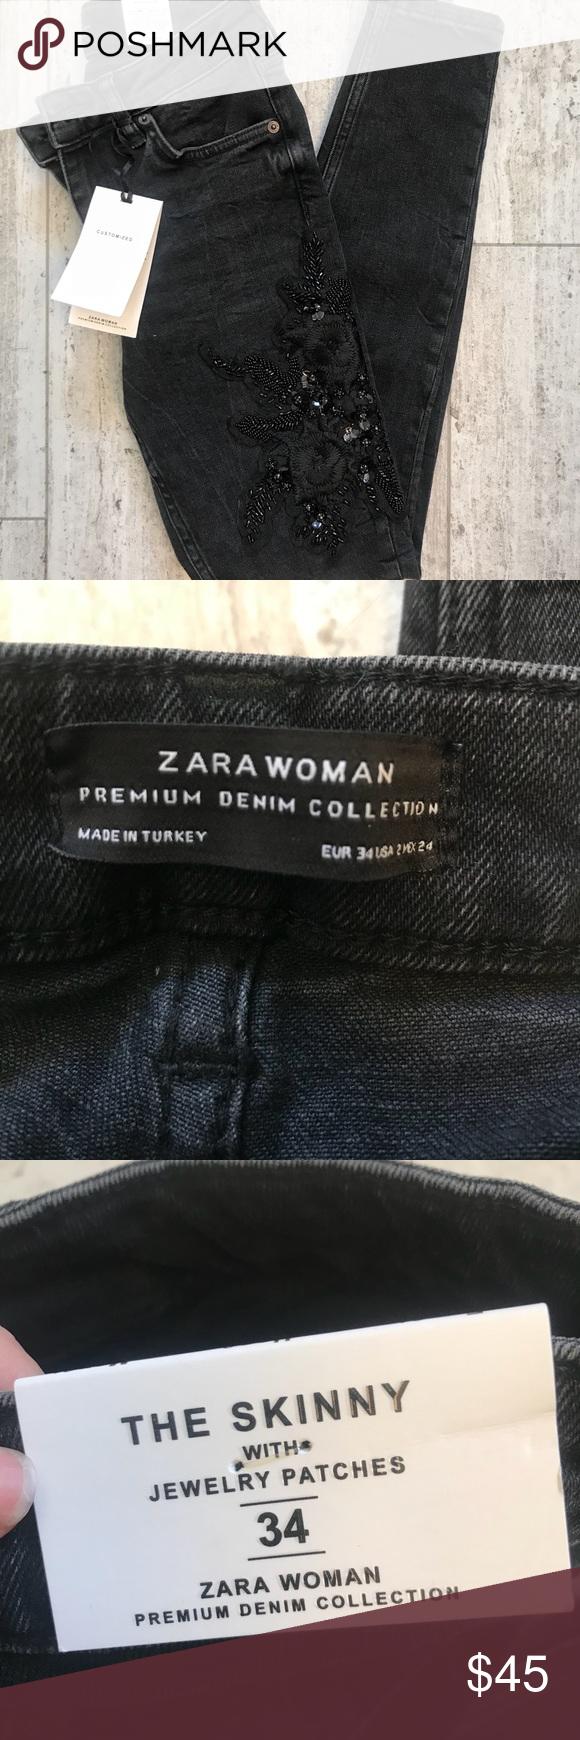 3dd99b11 Zara Women's Custom Premium Denim Jeans Black Brand new with tags ...